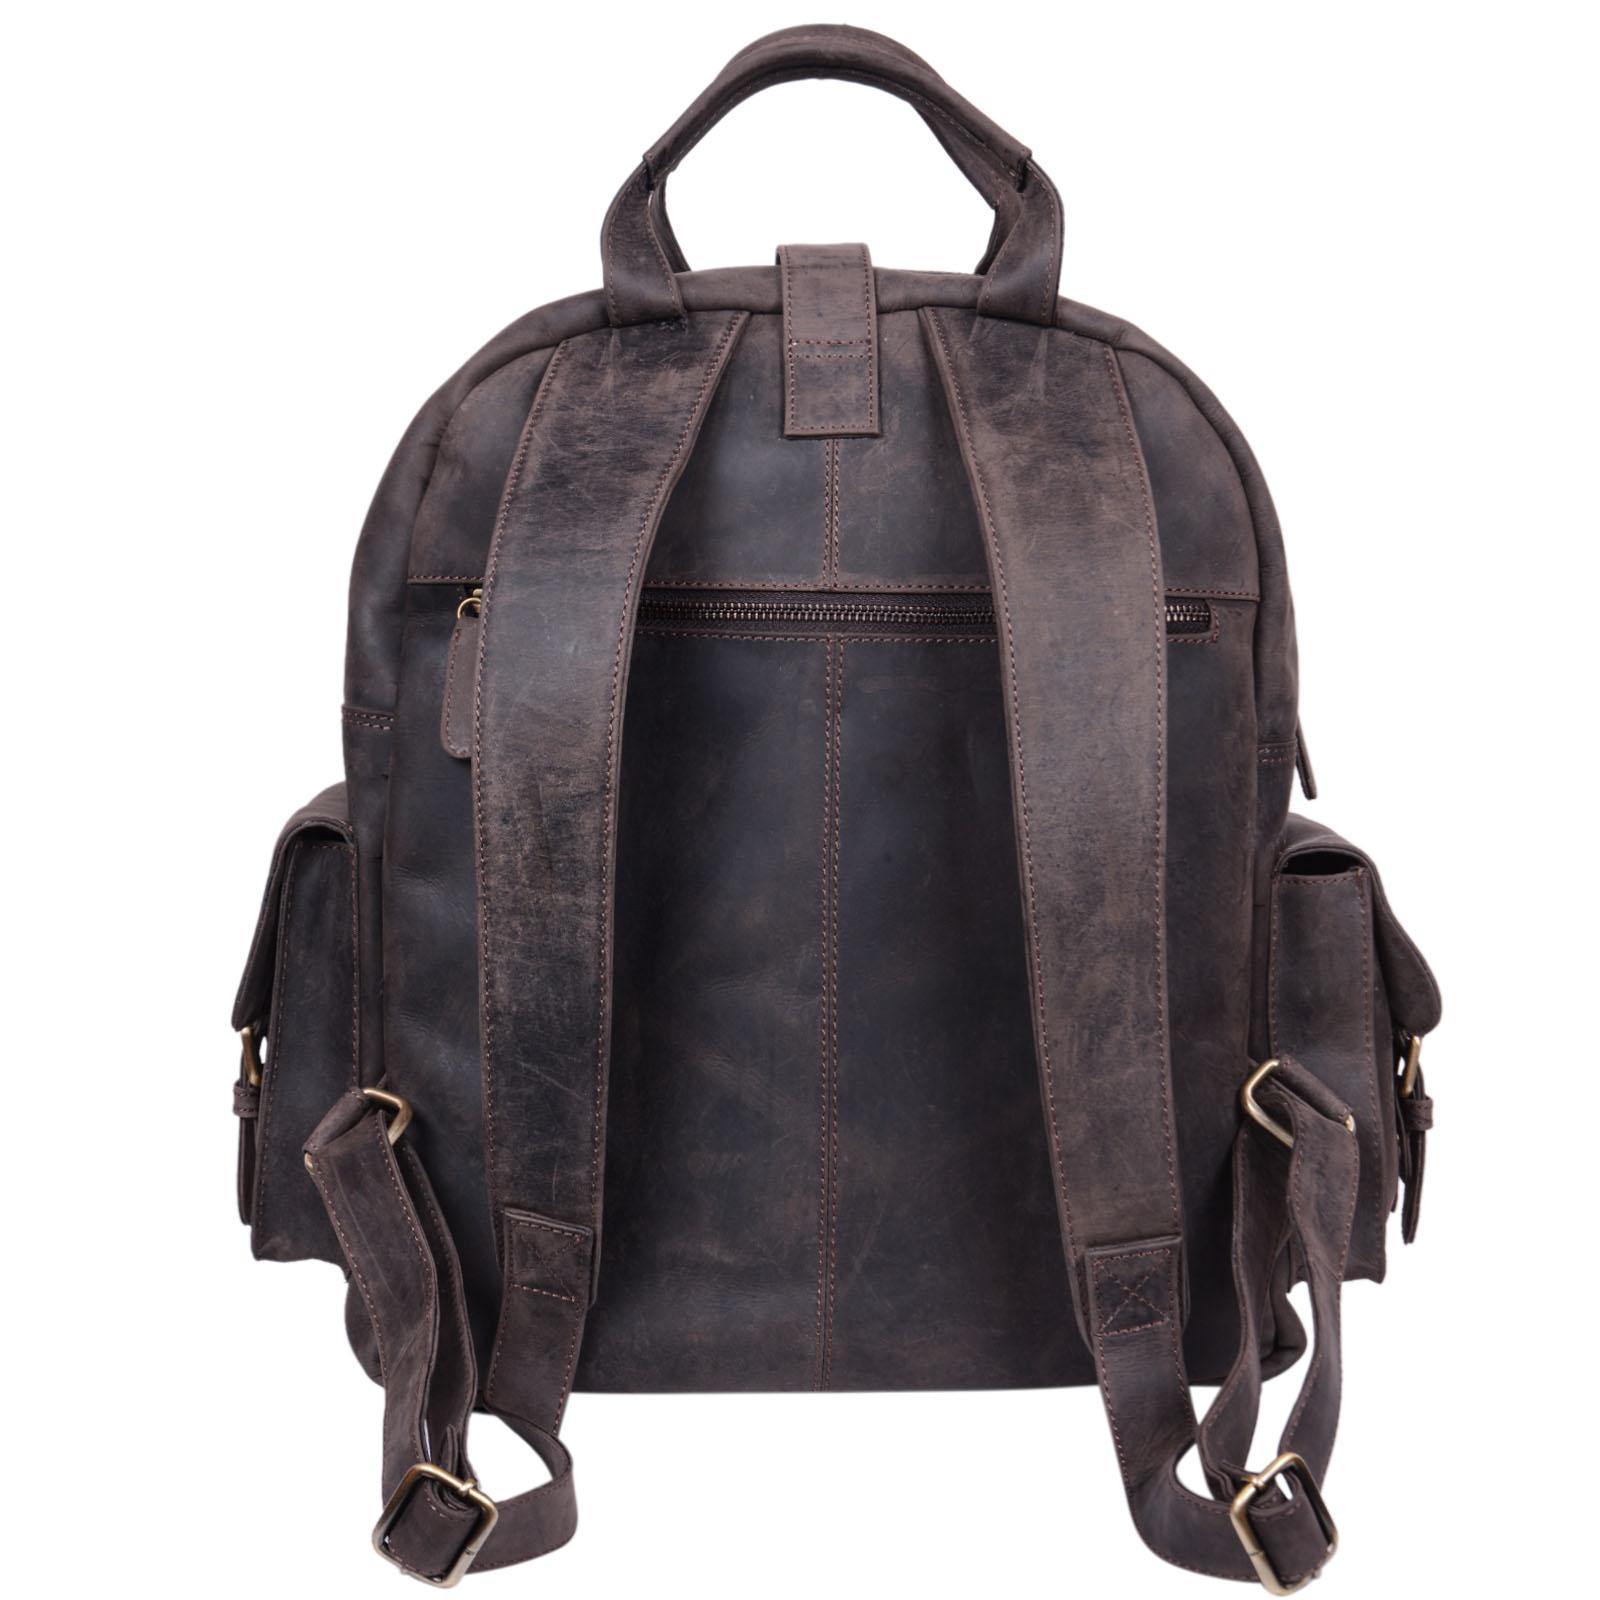 "STILORD ""Nevada"" Rucksack Leder groß im Vintage Design mit 13,3 Zoll Laptopfach Unisex Lederrucksack Uni Schule Lehrer Echtleder  - Bild 12"